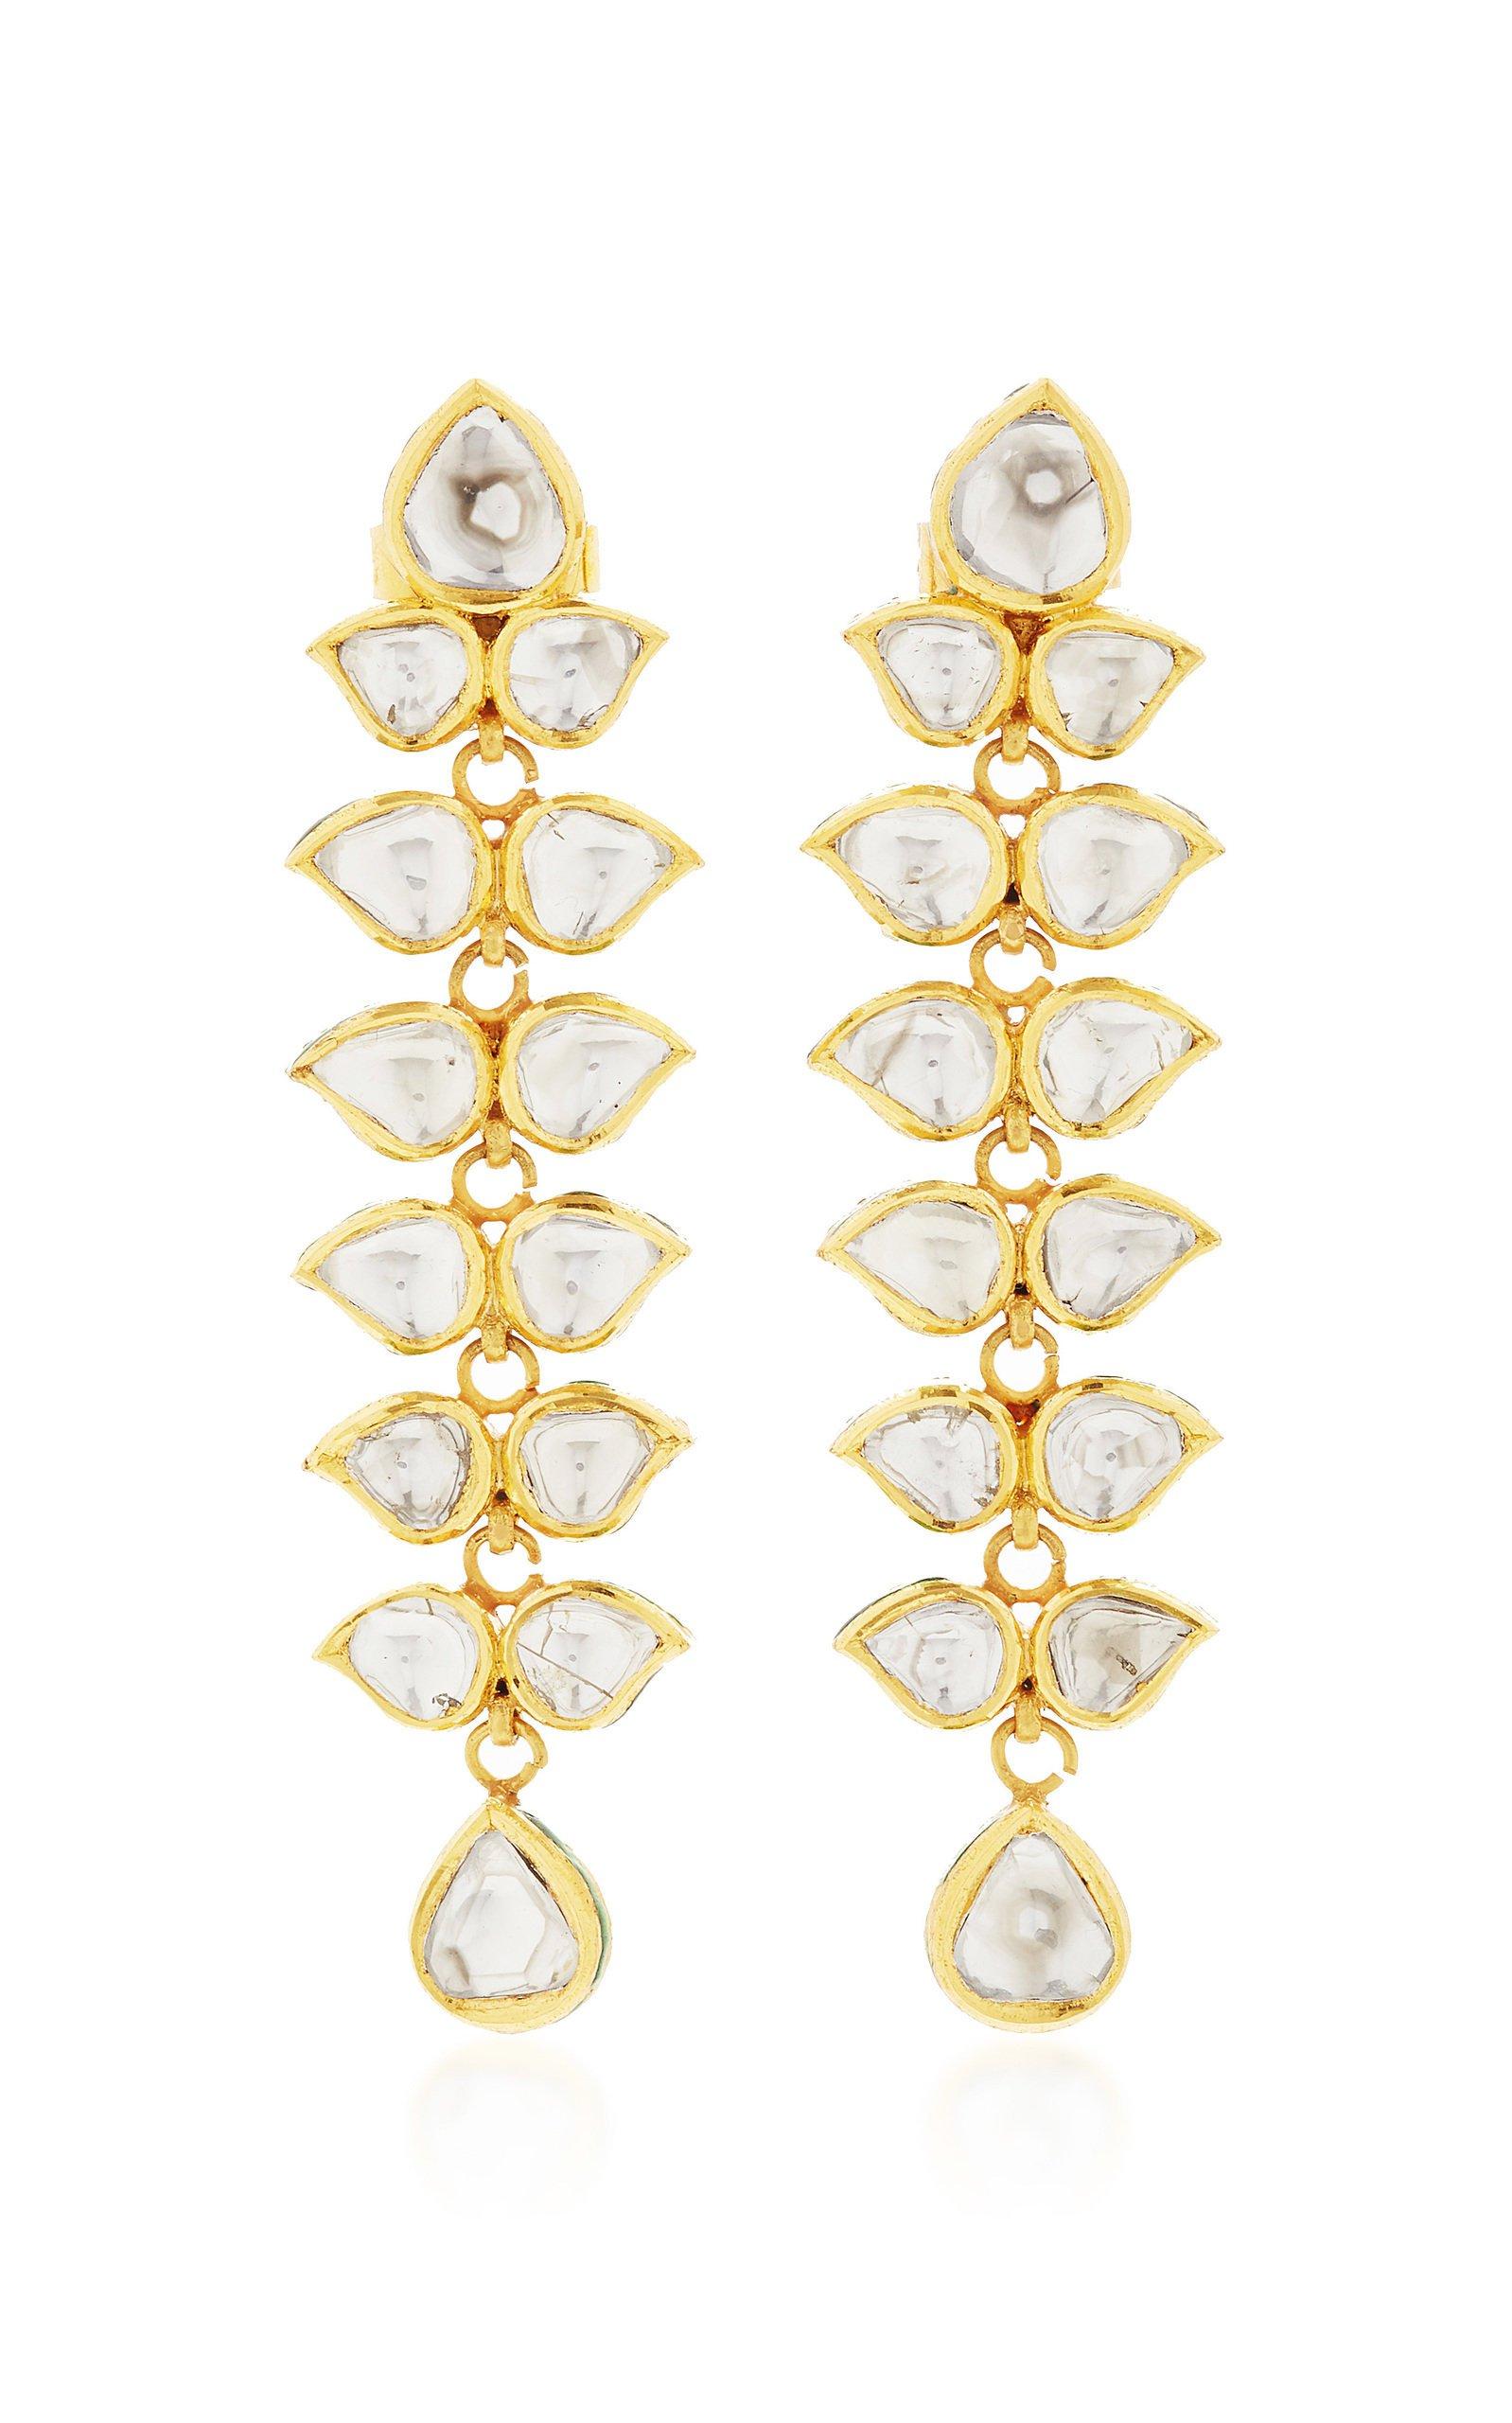 Sanjay Kasliwal Raj 22k Gold and Diamond Earrings